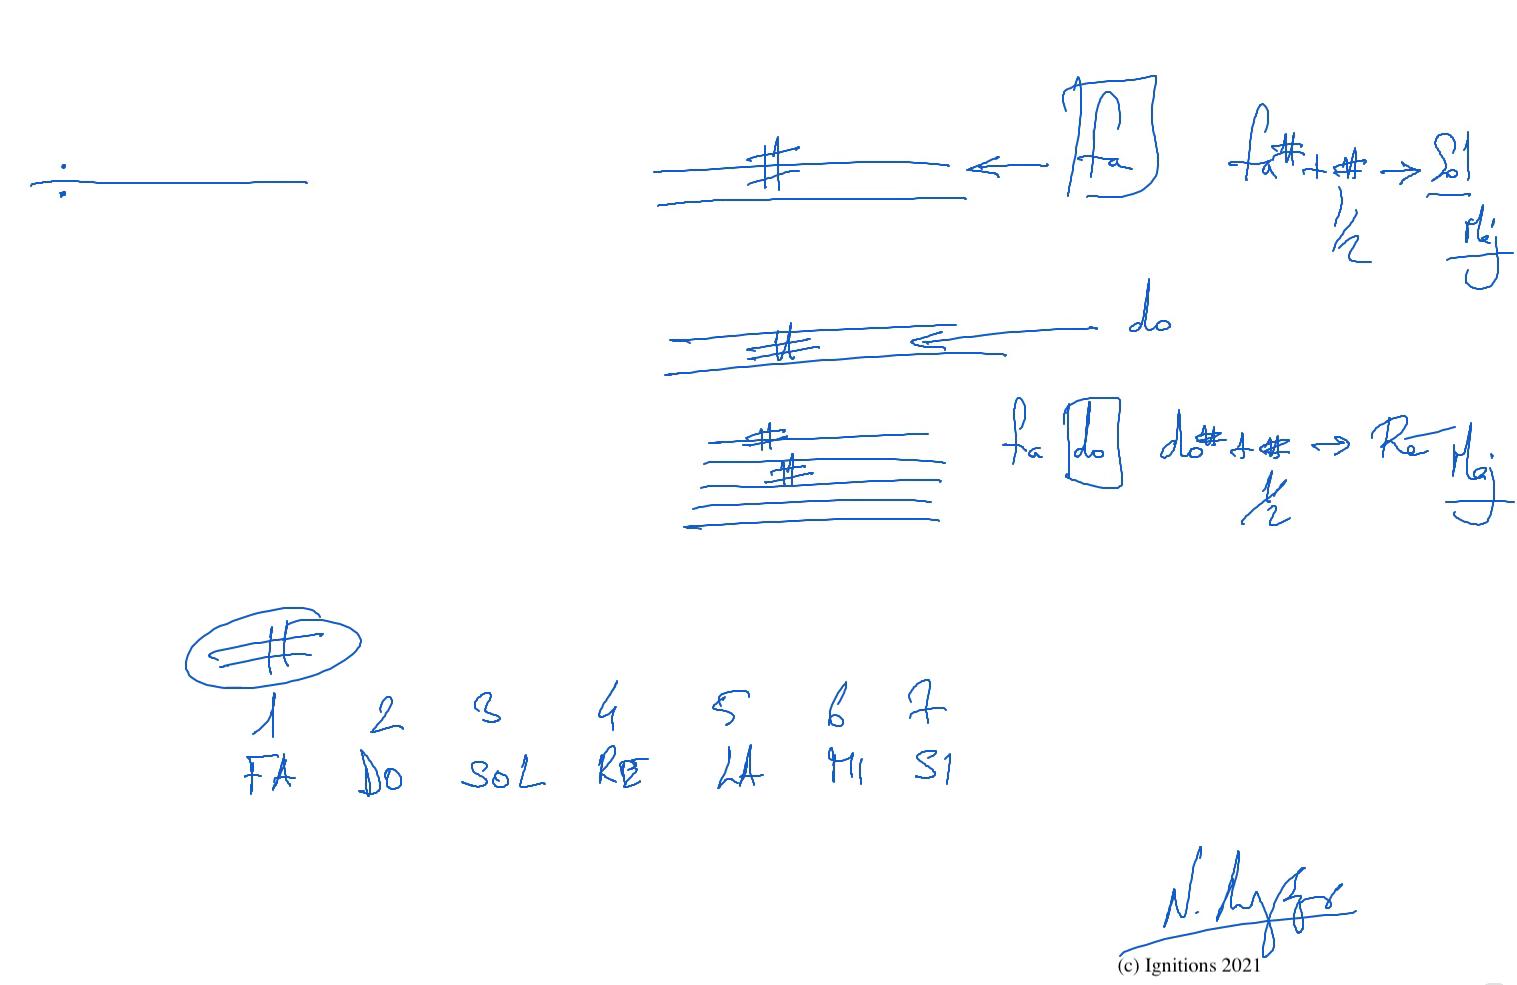 58341 - e-Μάθημα I:Majeur, mineur, gammes, catalogue.(Dessin)